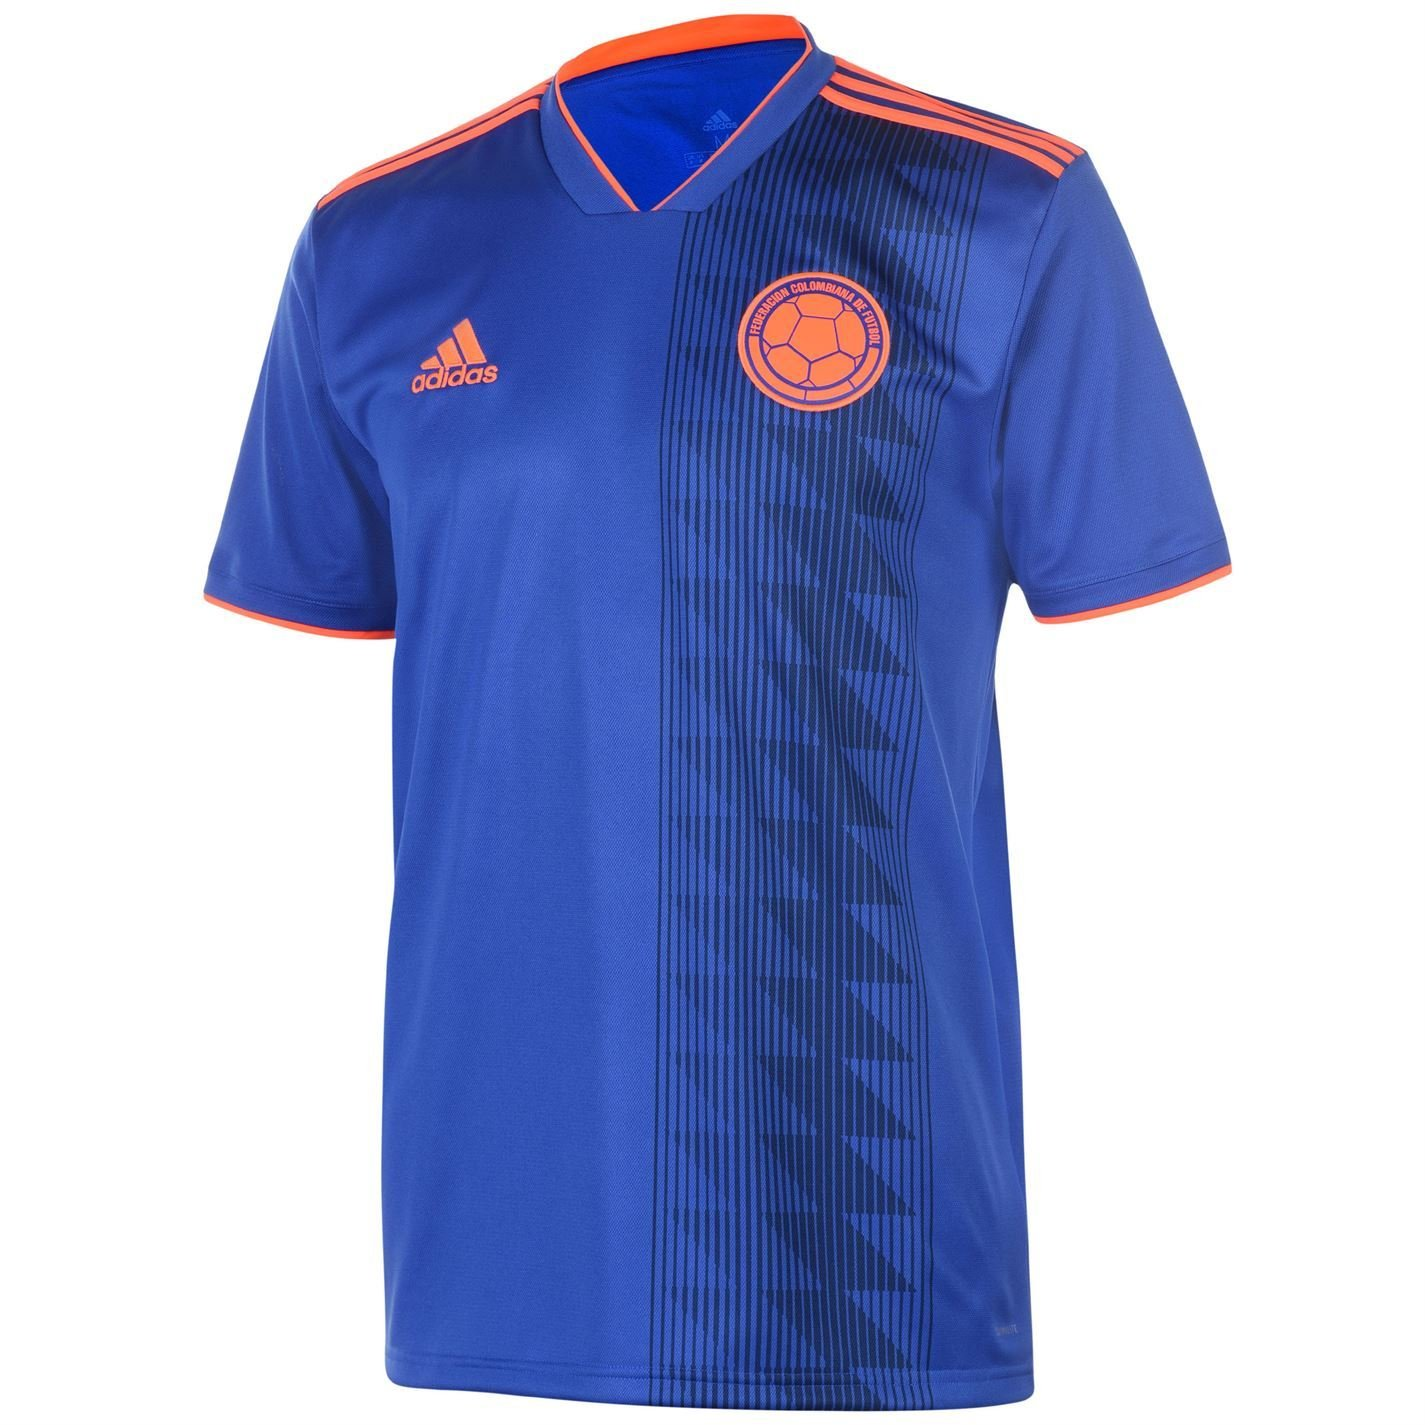 adidas 2018-2019 Colombia Away Football Shirt